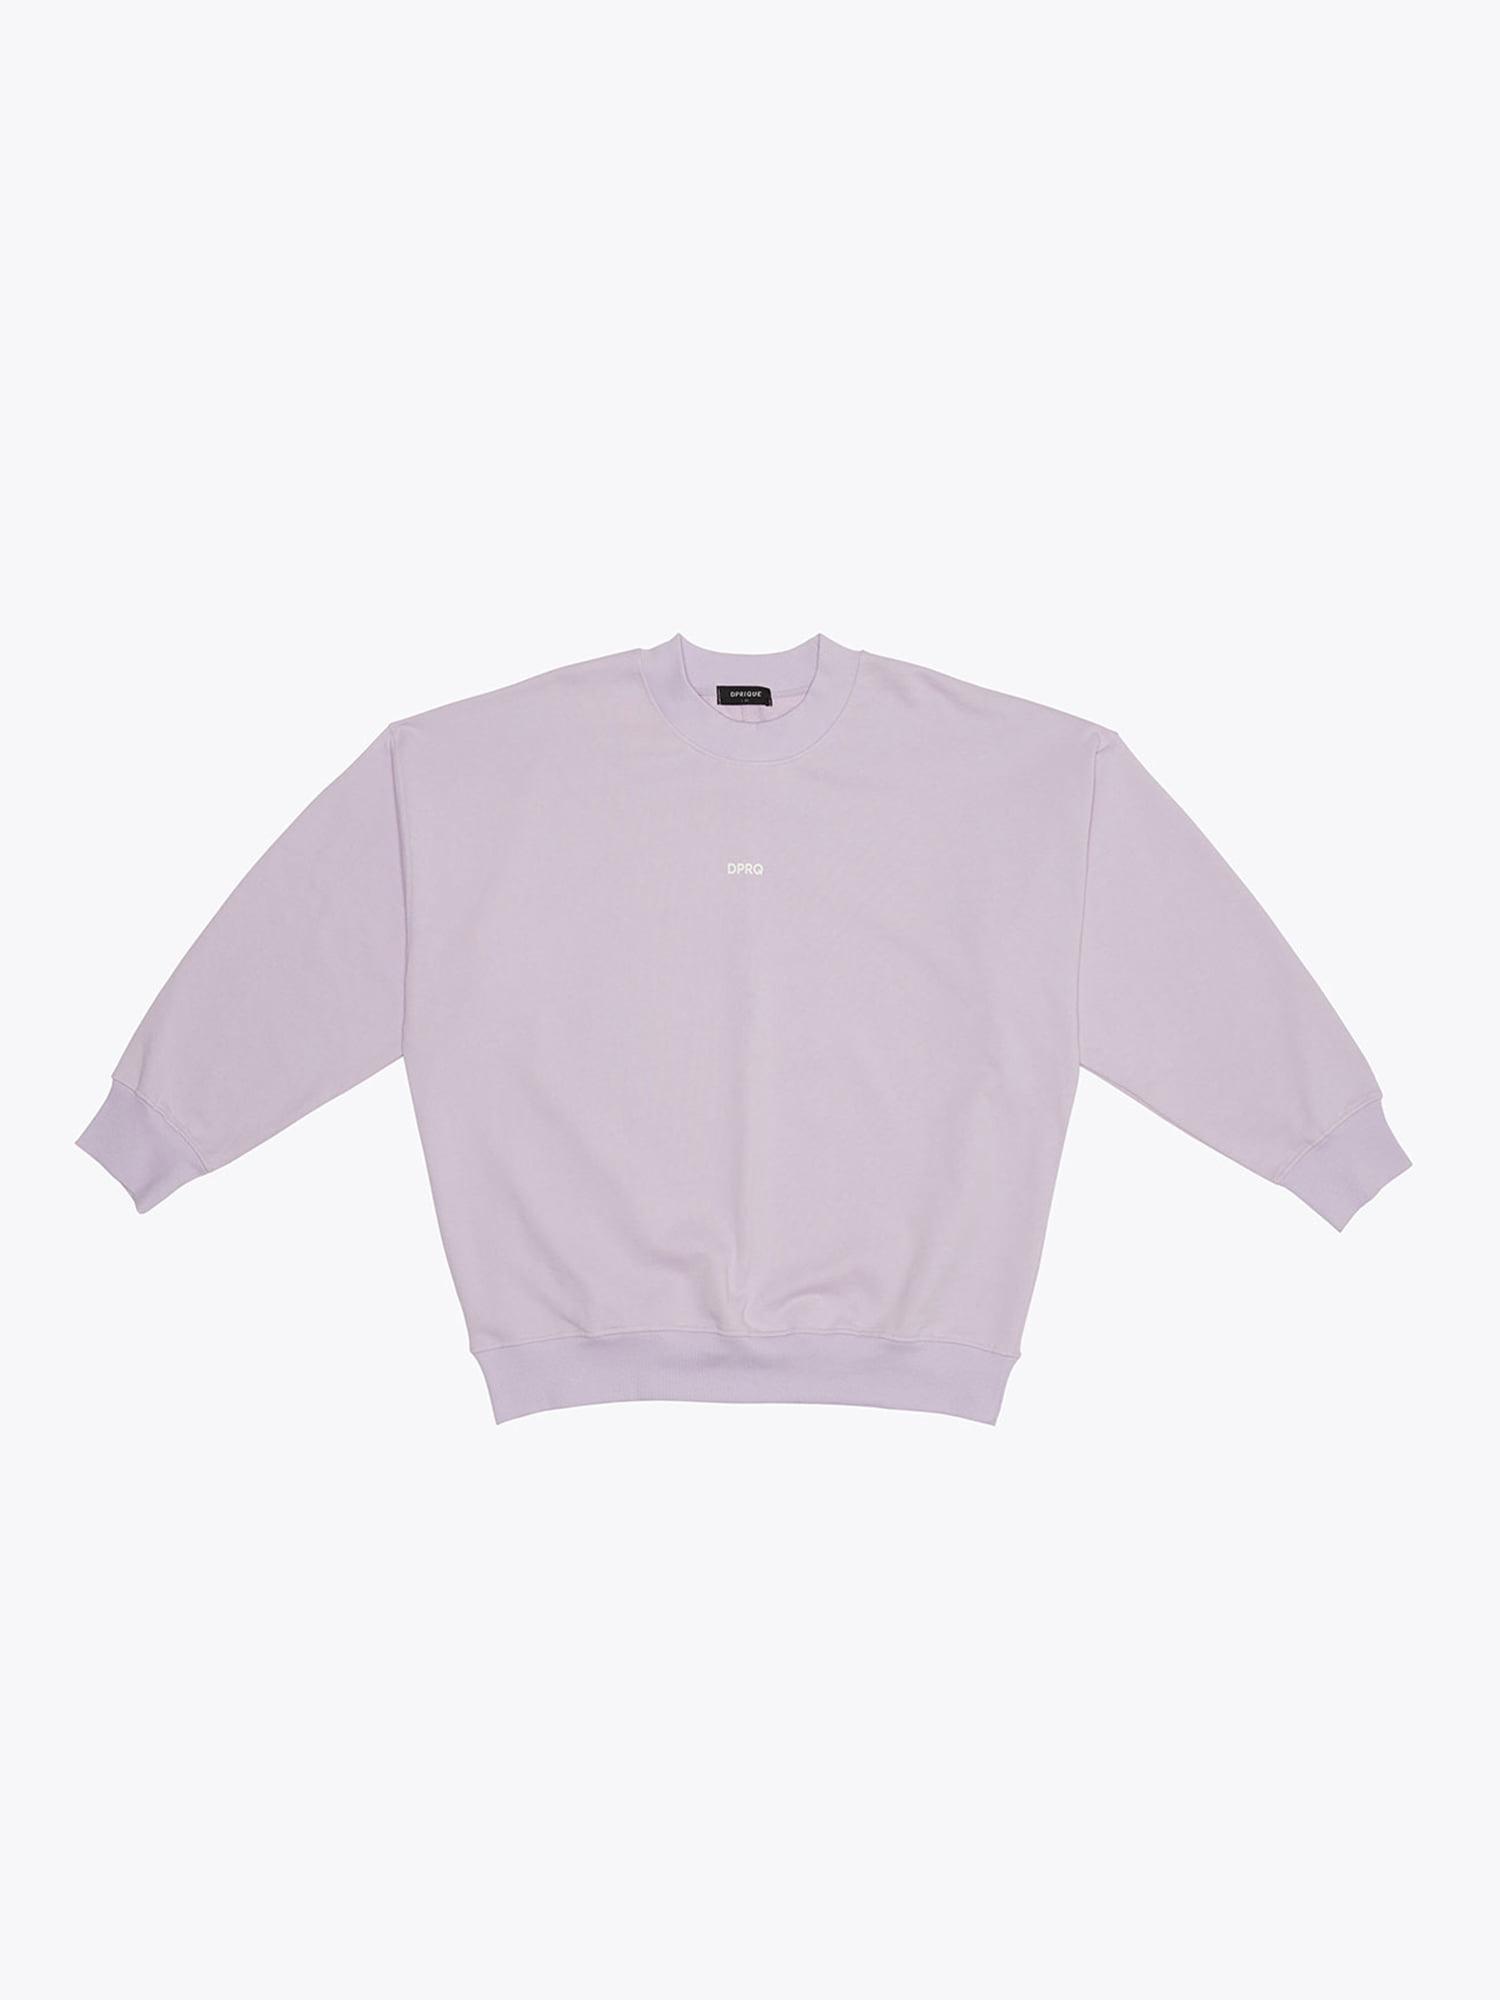 DPRQ Sweatshirt - Purple